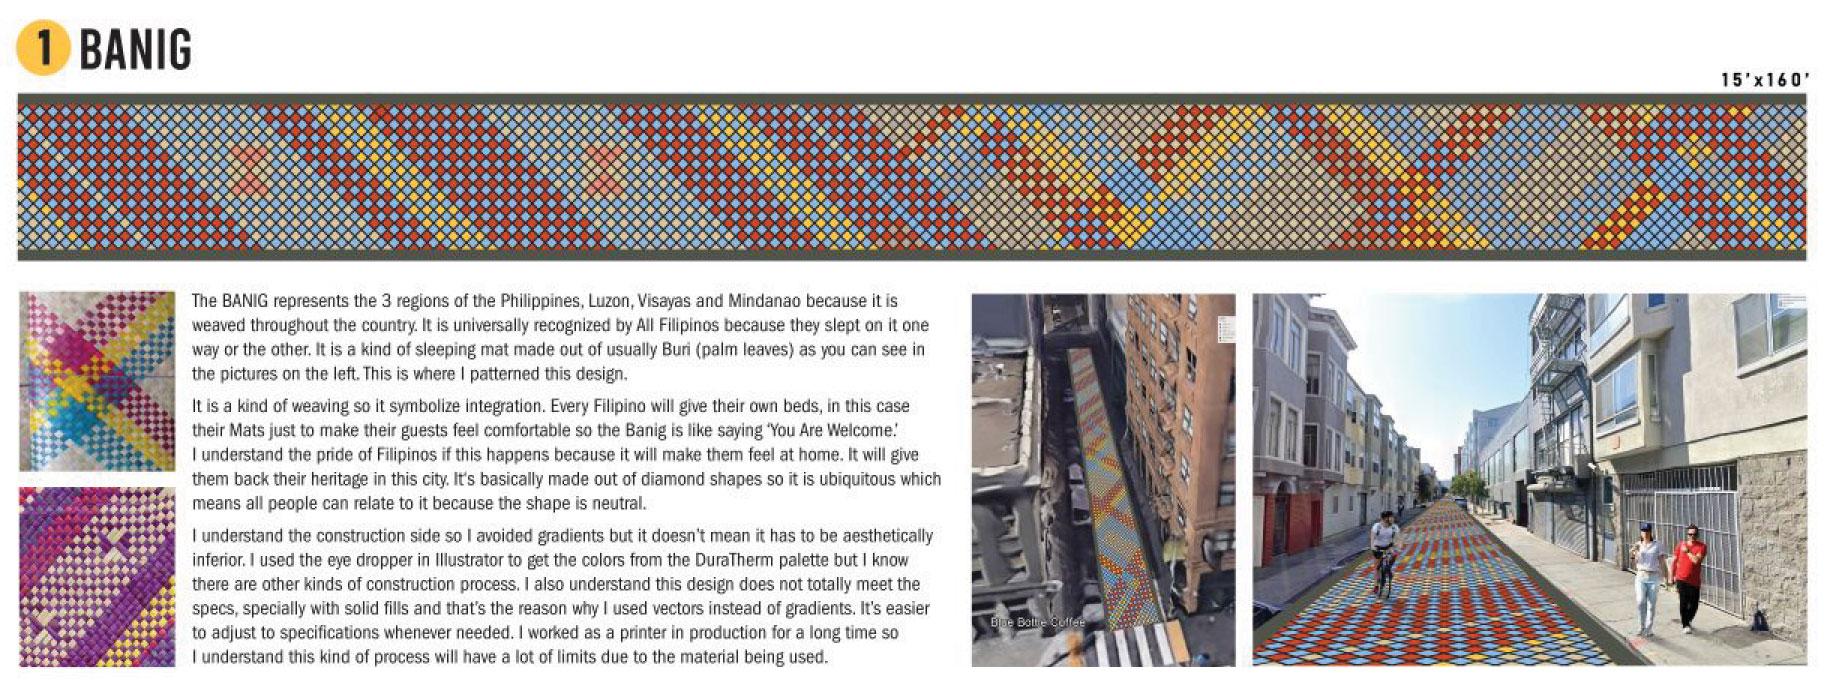 Image of woven pattern on street.